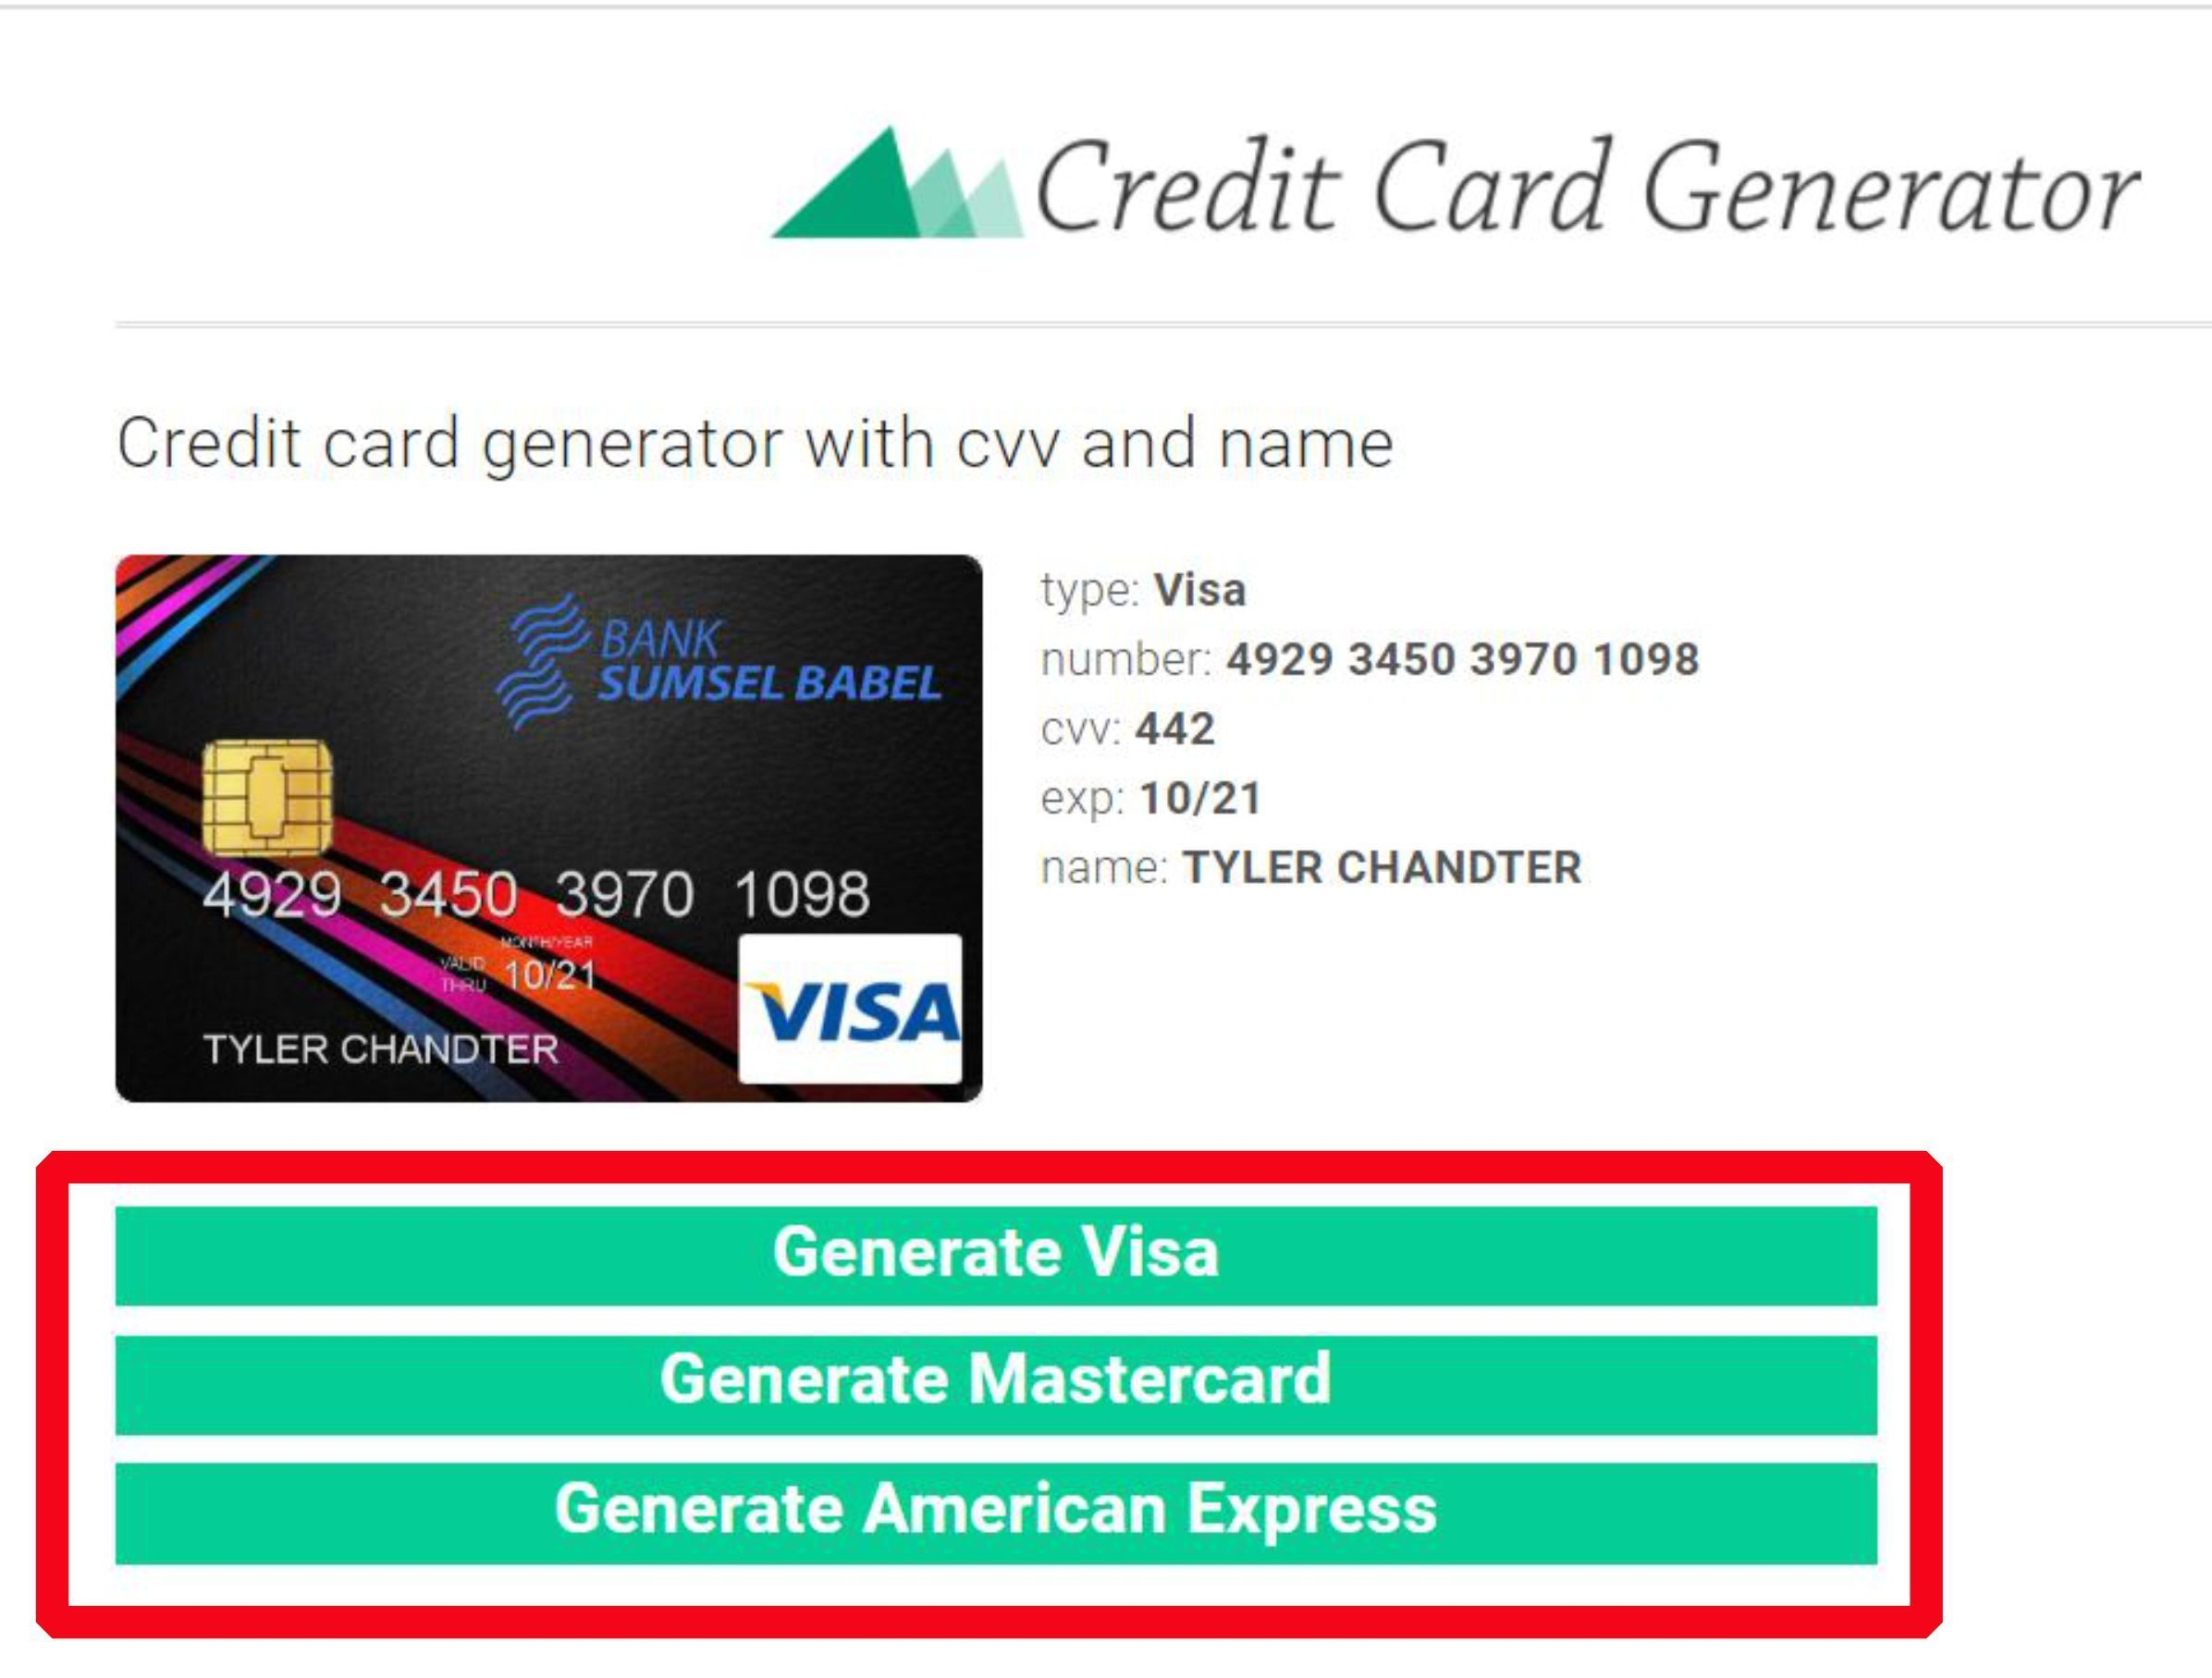 Creditcard Generator Credit Card Online Credit Card Info Credit Card